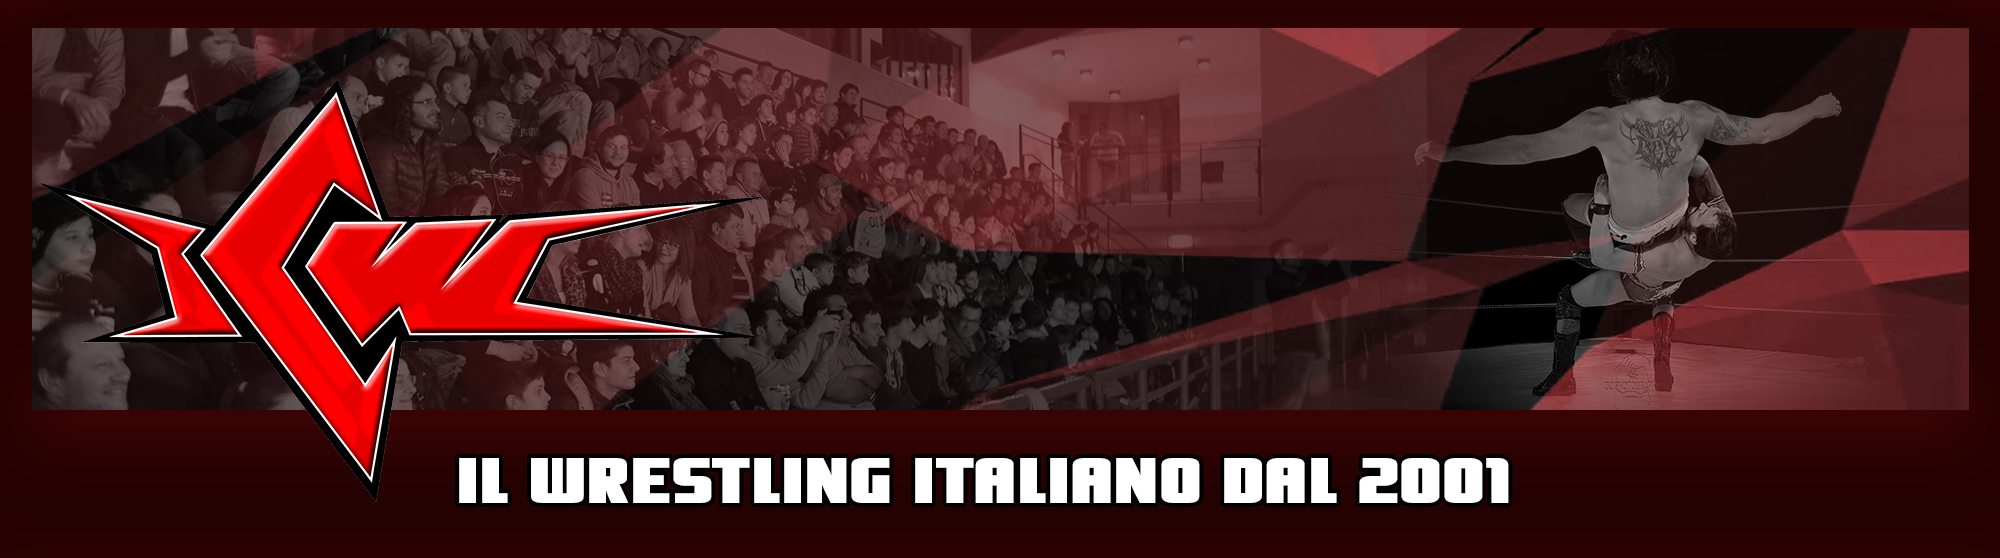 ICW – Italian Championship Wrestling a.s.d. – I Campioni del Wrestling!